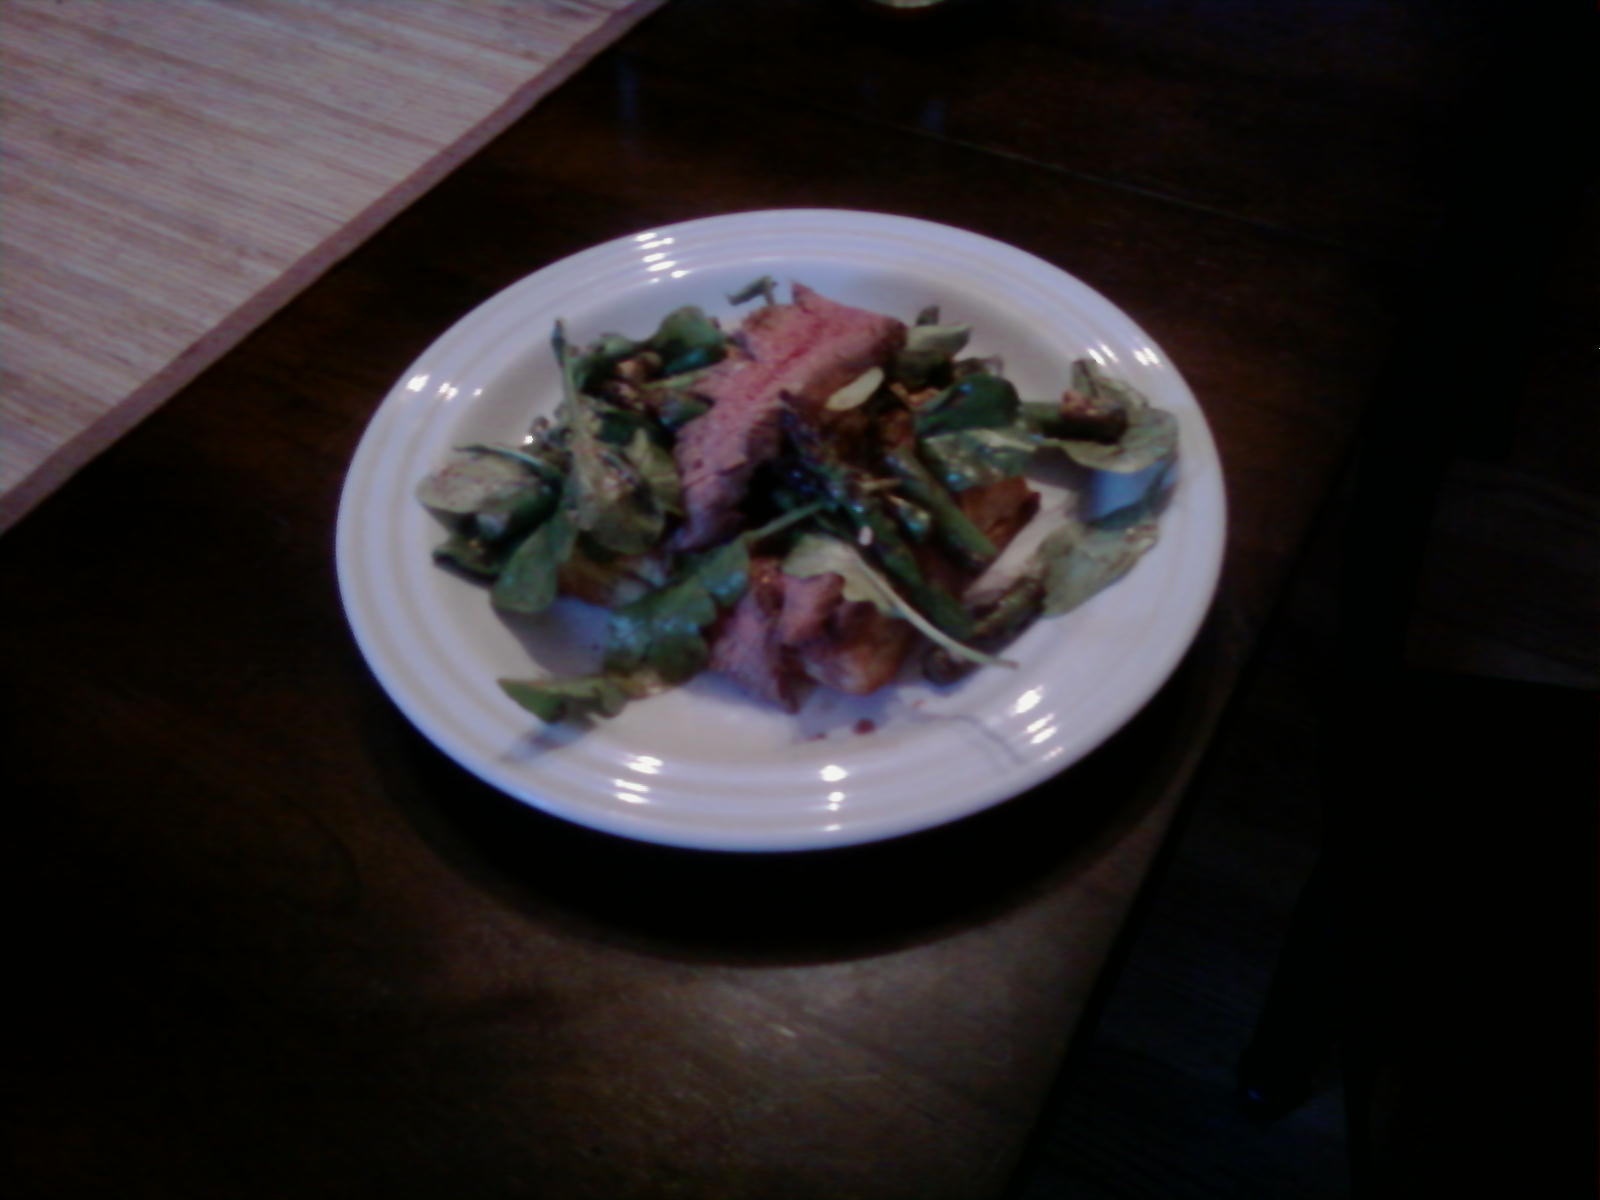 http://2.bp.blogspot.com/_IbfRTMkMQpk/TAb8IzLmbqI/AAAAAAAAAIA/4zeu2h0uHjI/s1600/Dinner.jpg